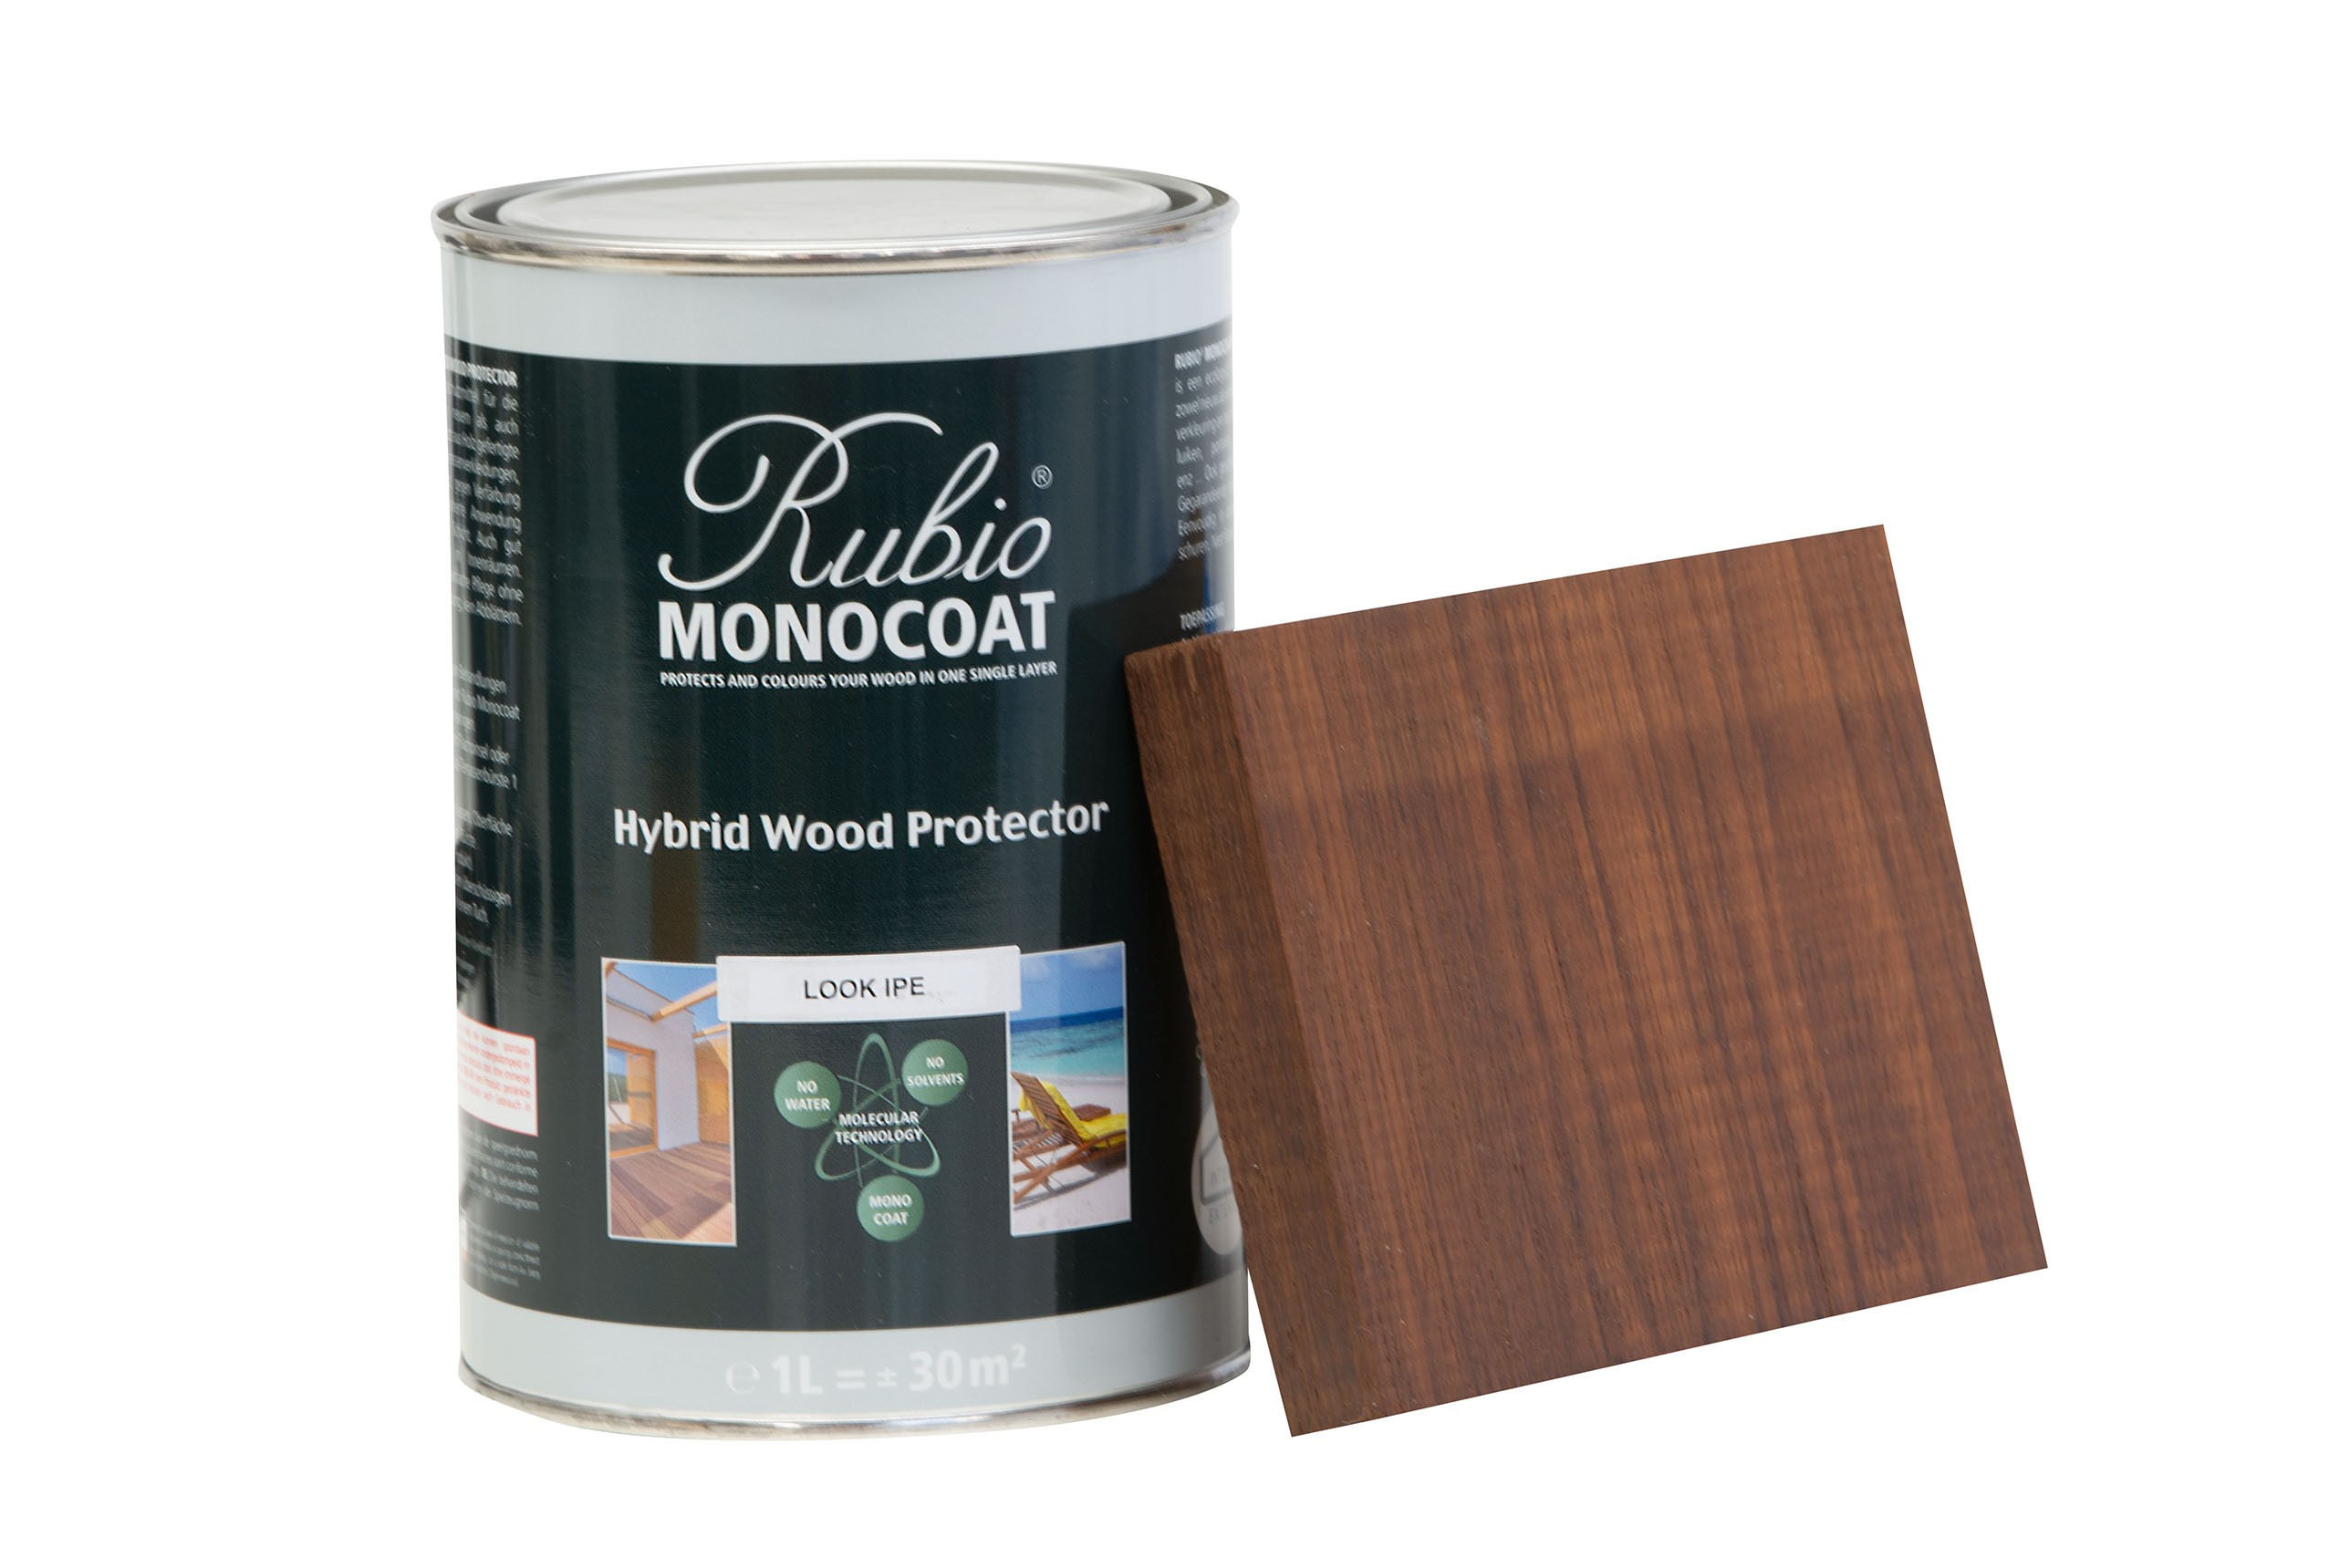 Monocoat hybrid wood protector look ipé 1 liter